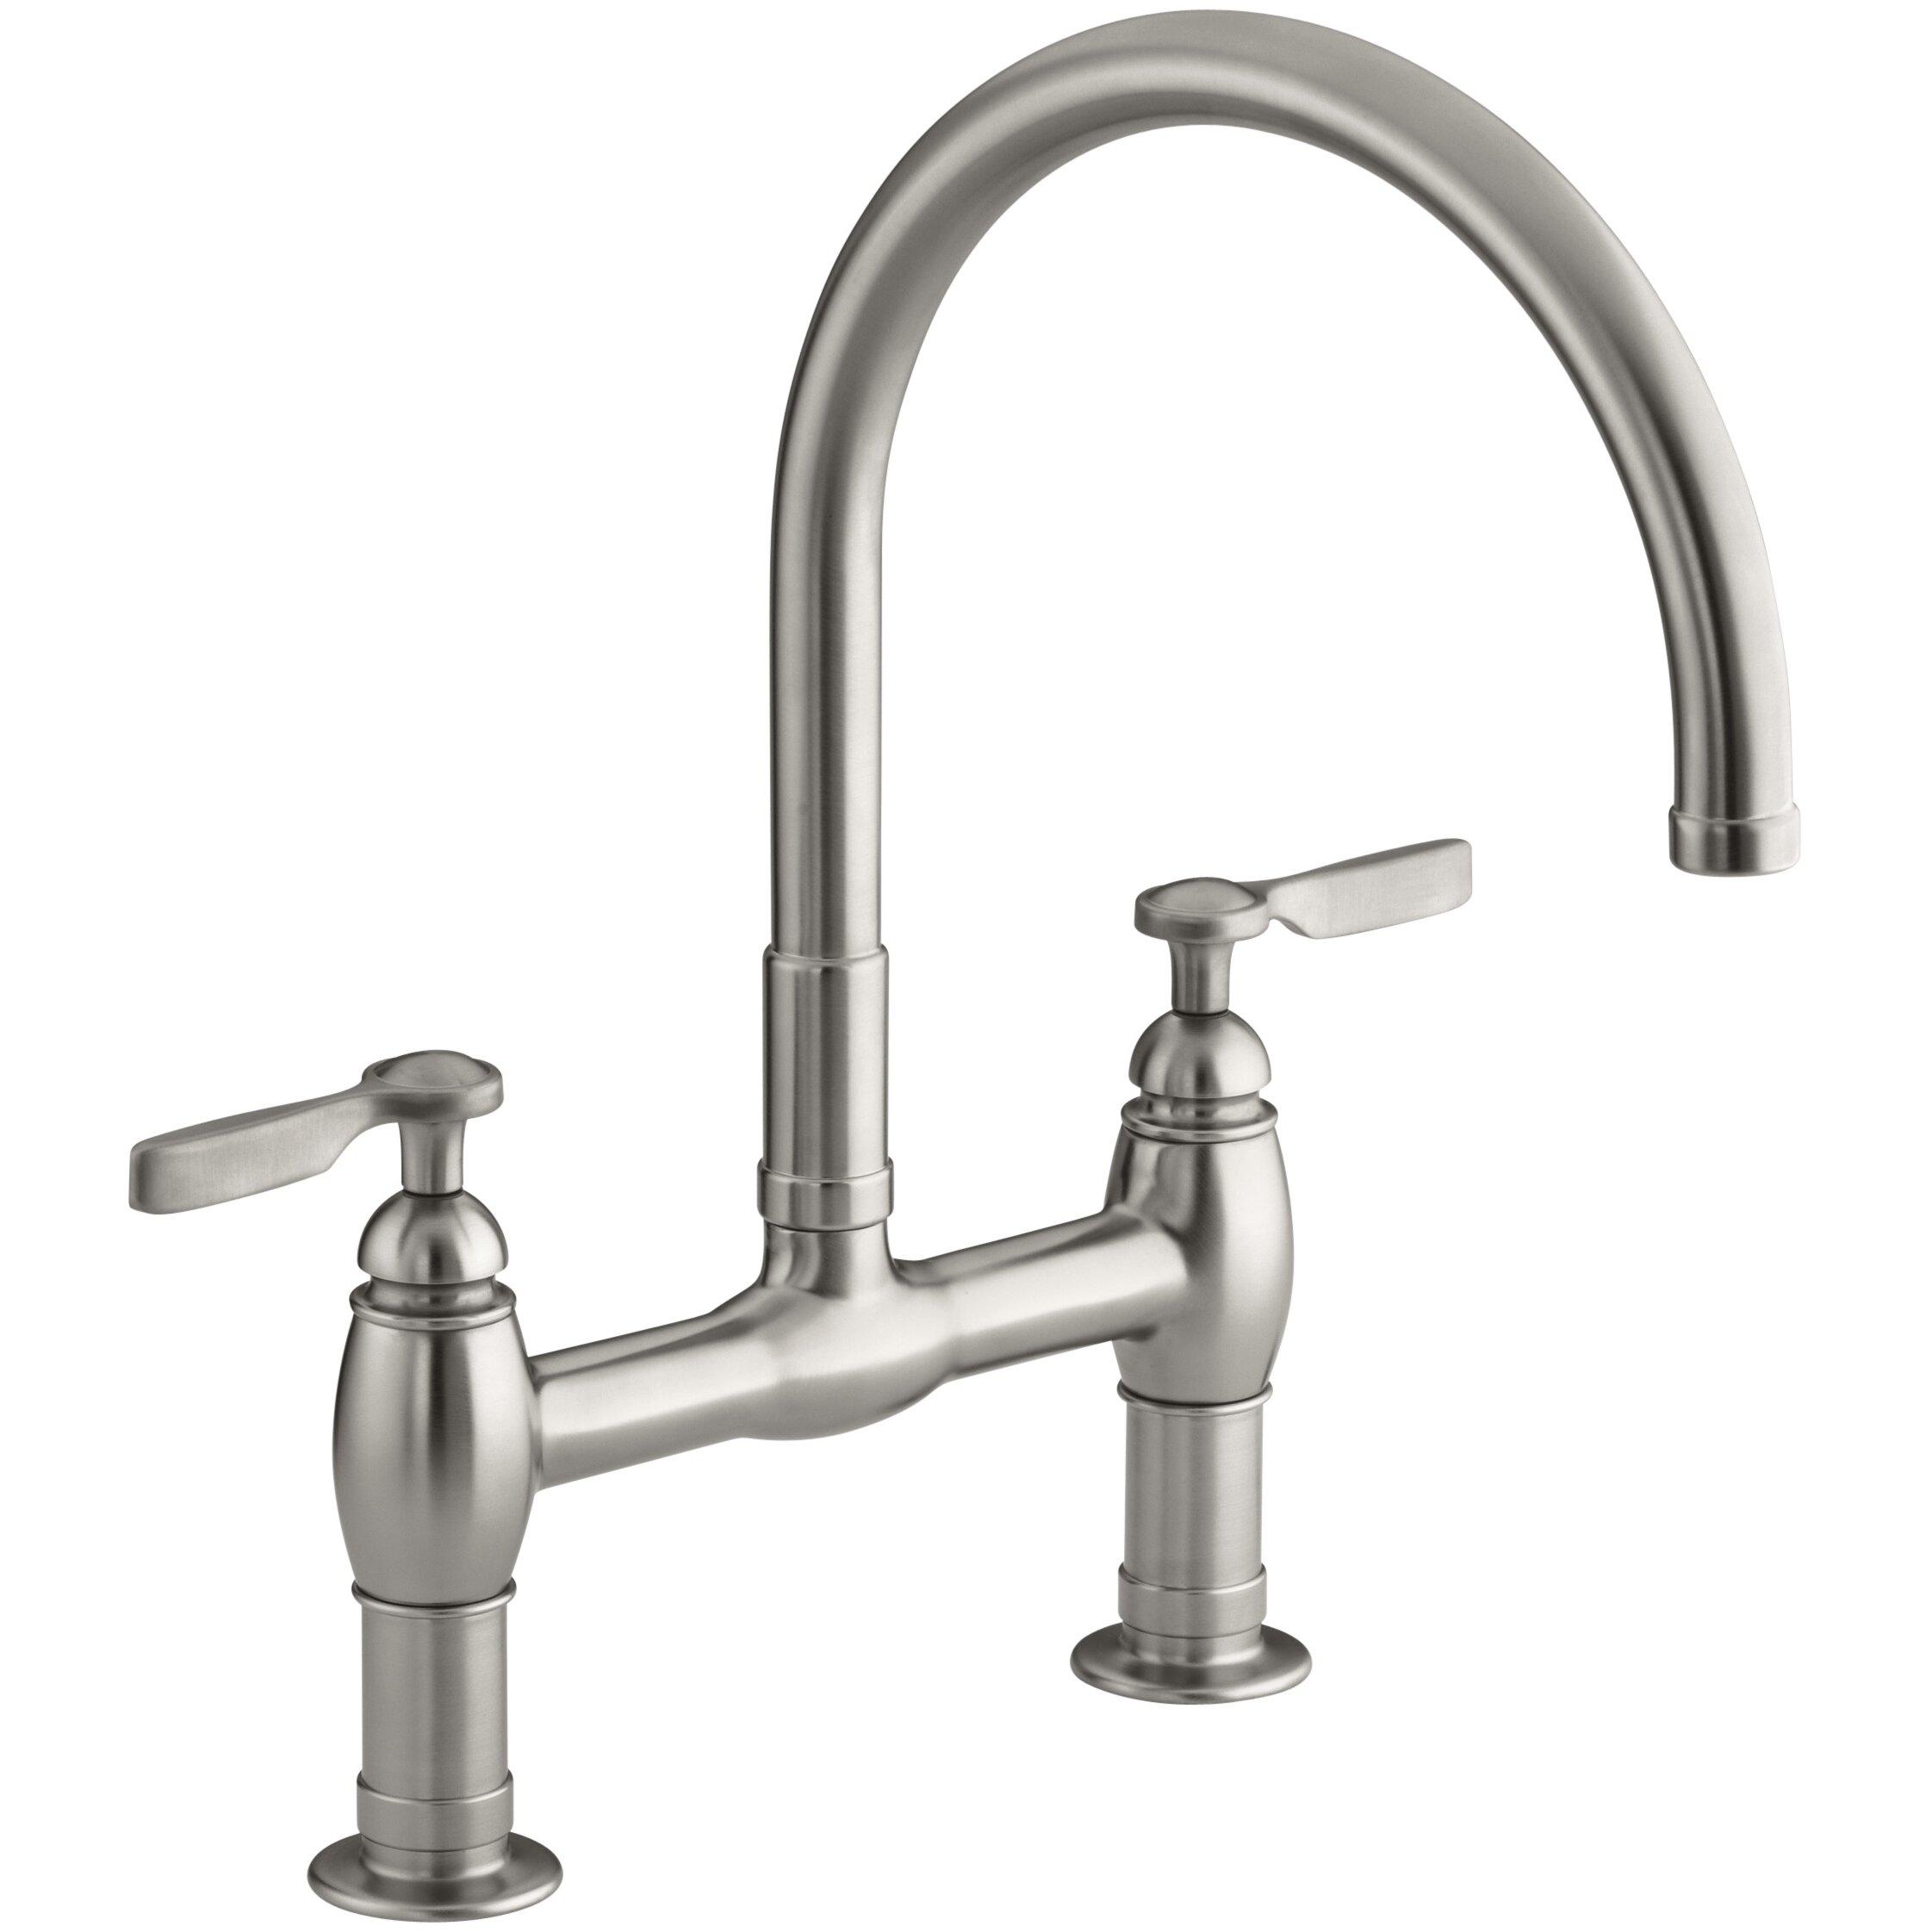 Parq Kohler Faucet In Kitchen